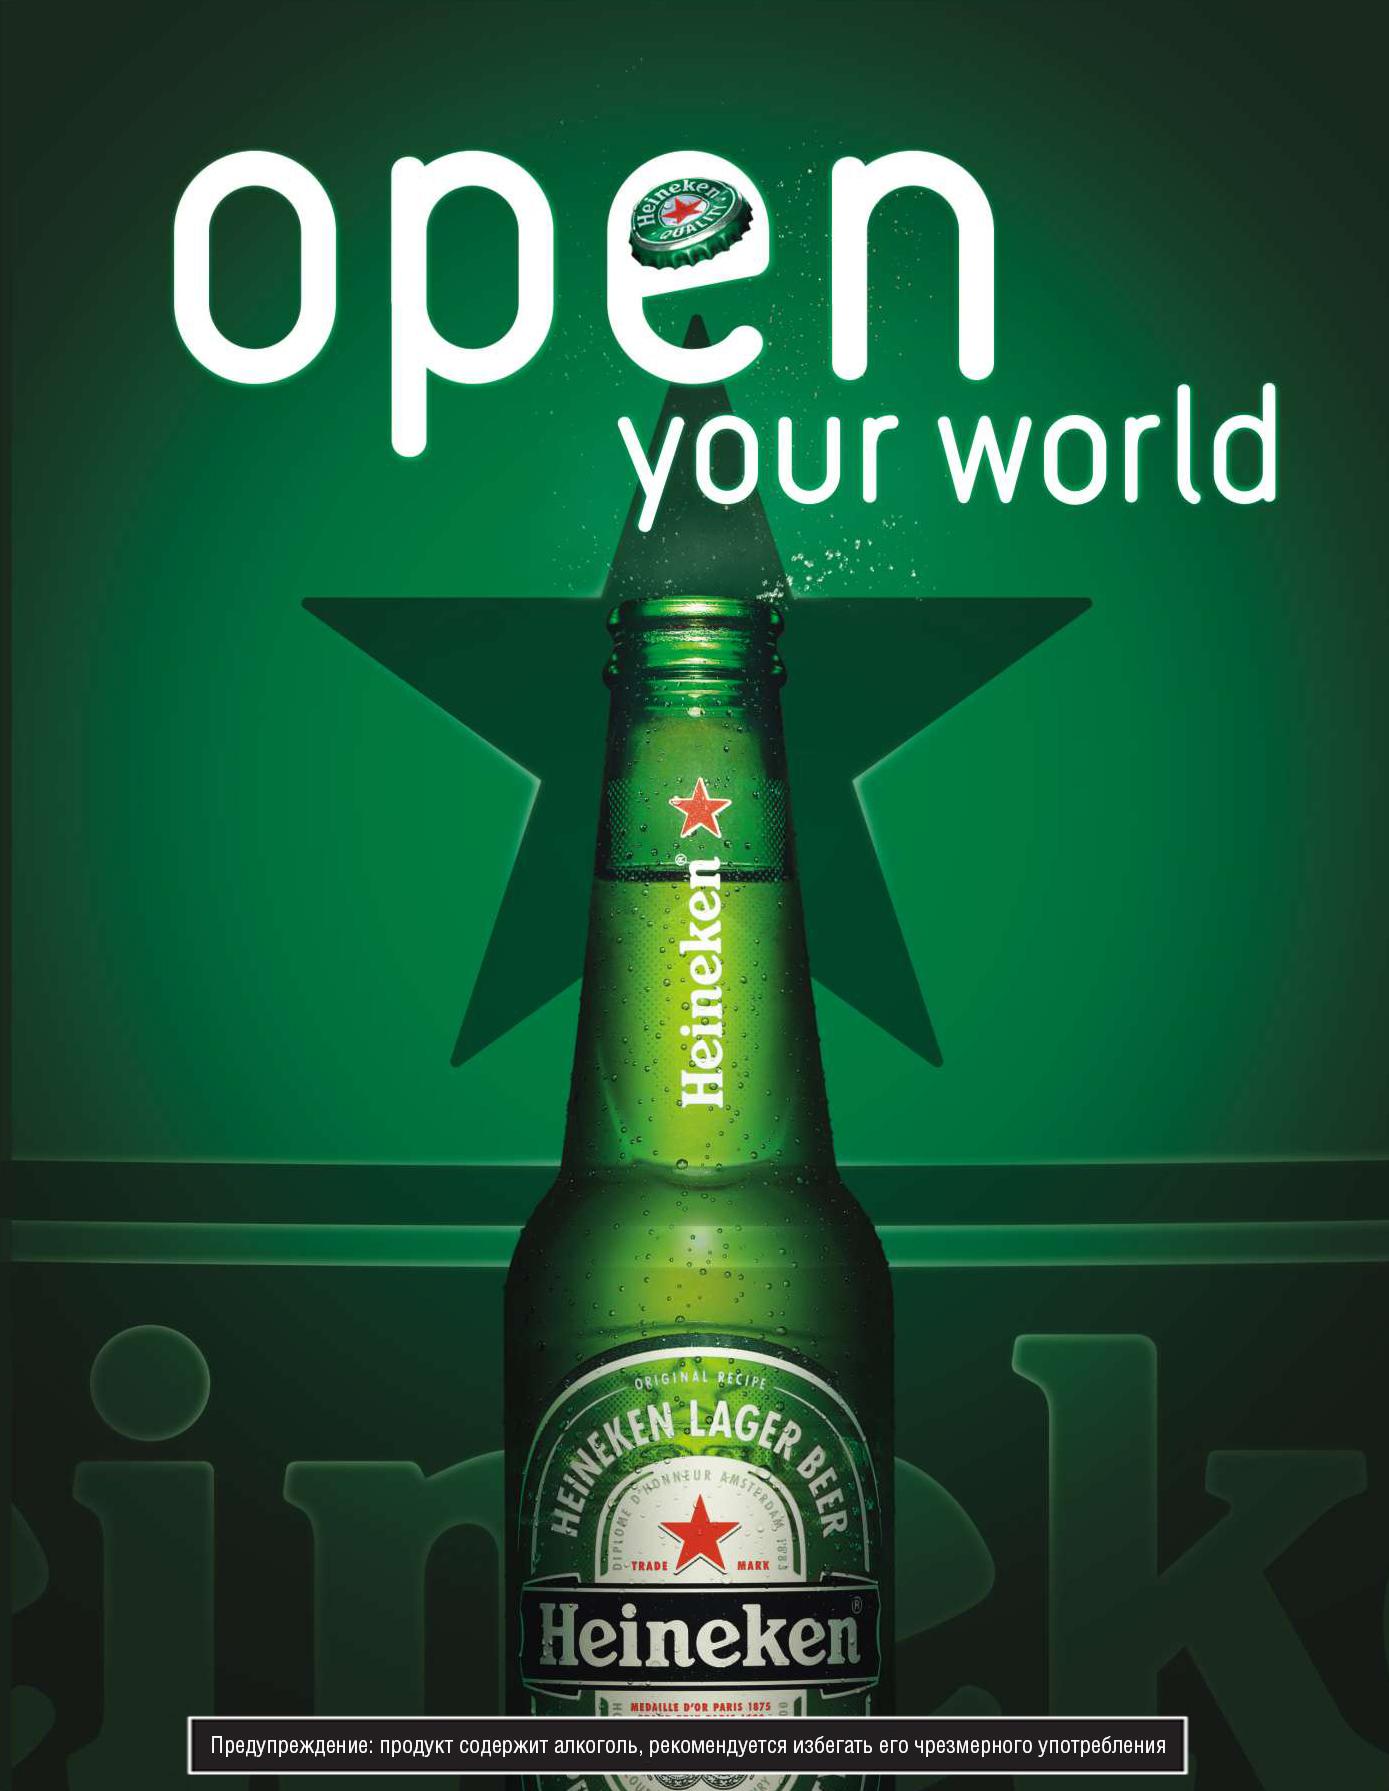 Каннские львы предпочитают Heineken